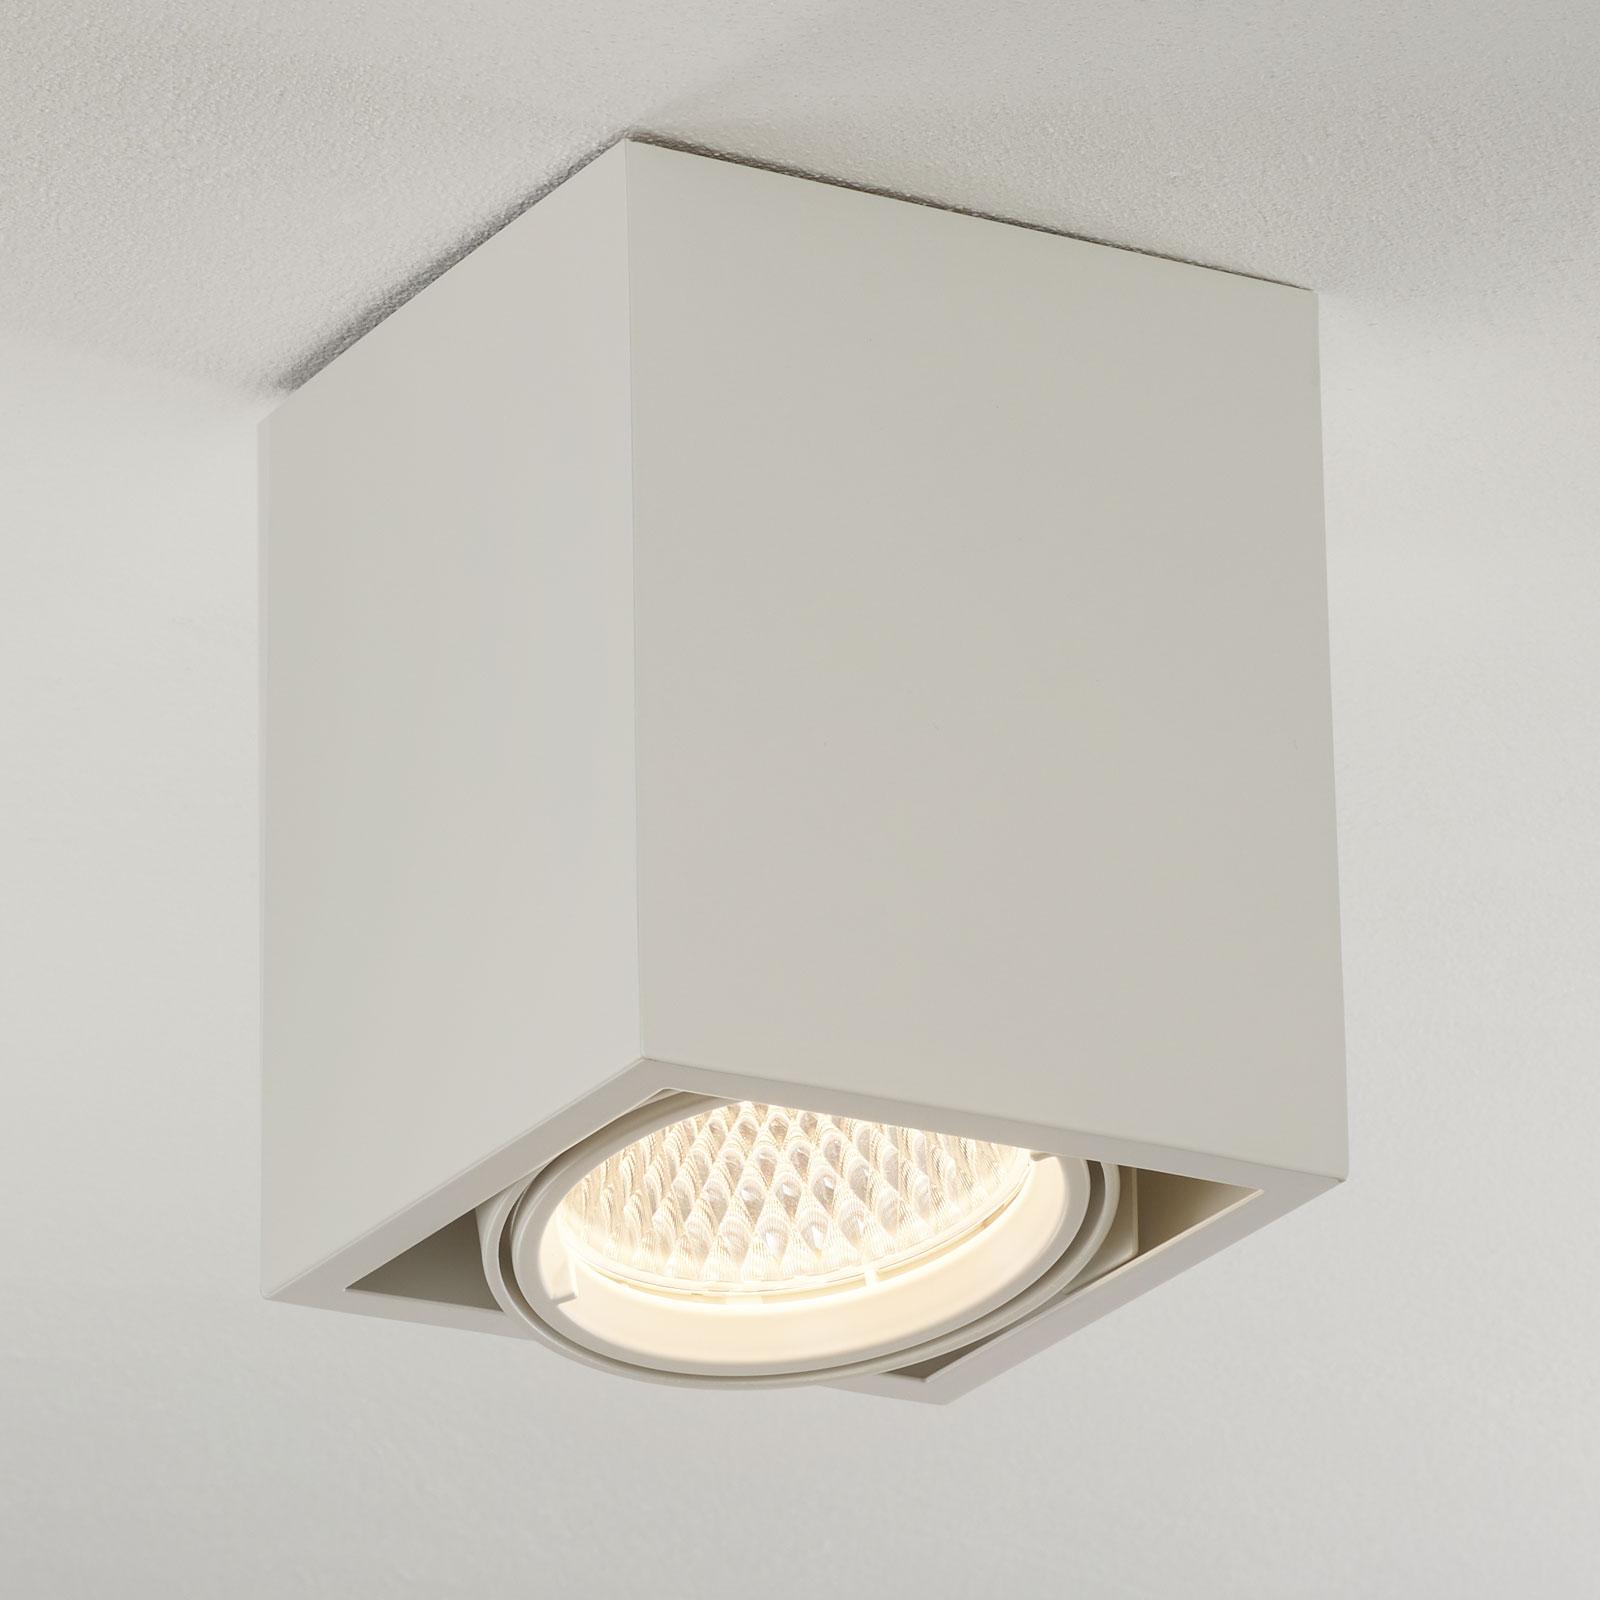 Arcchio Cirdan LED plafondlamp 1-lamp wit